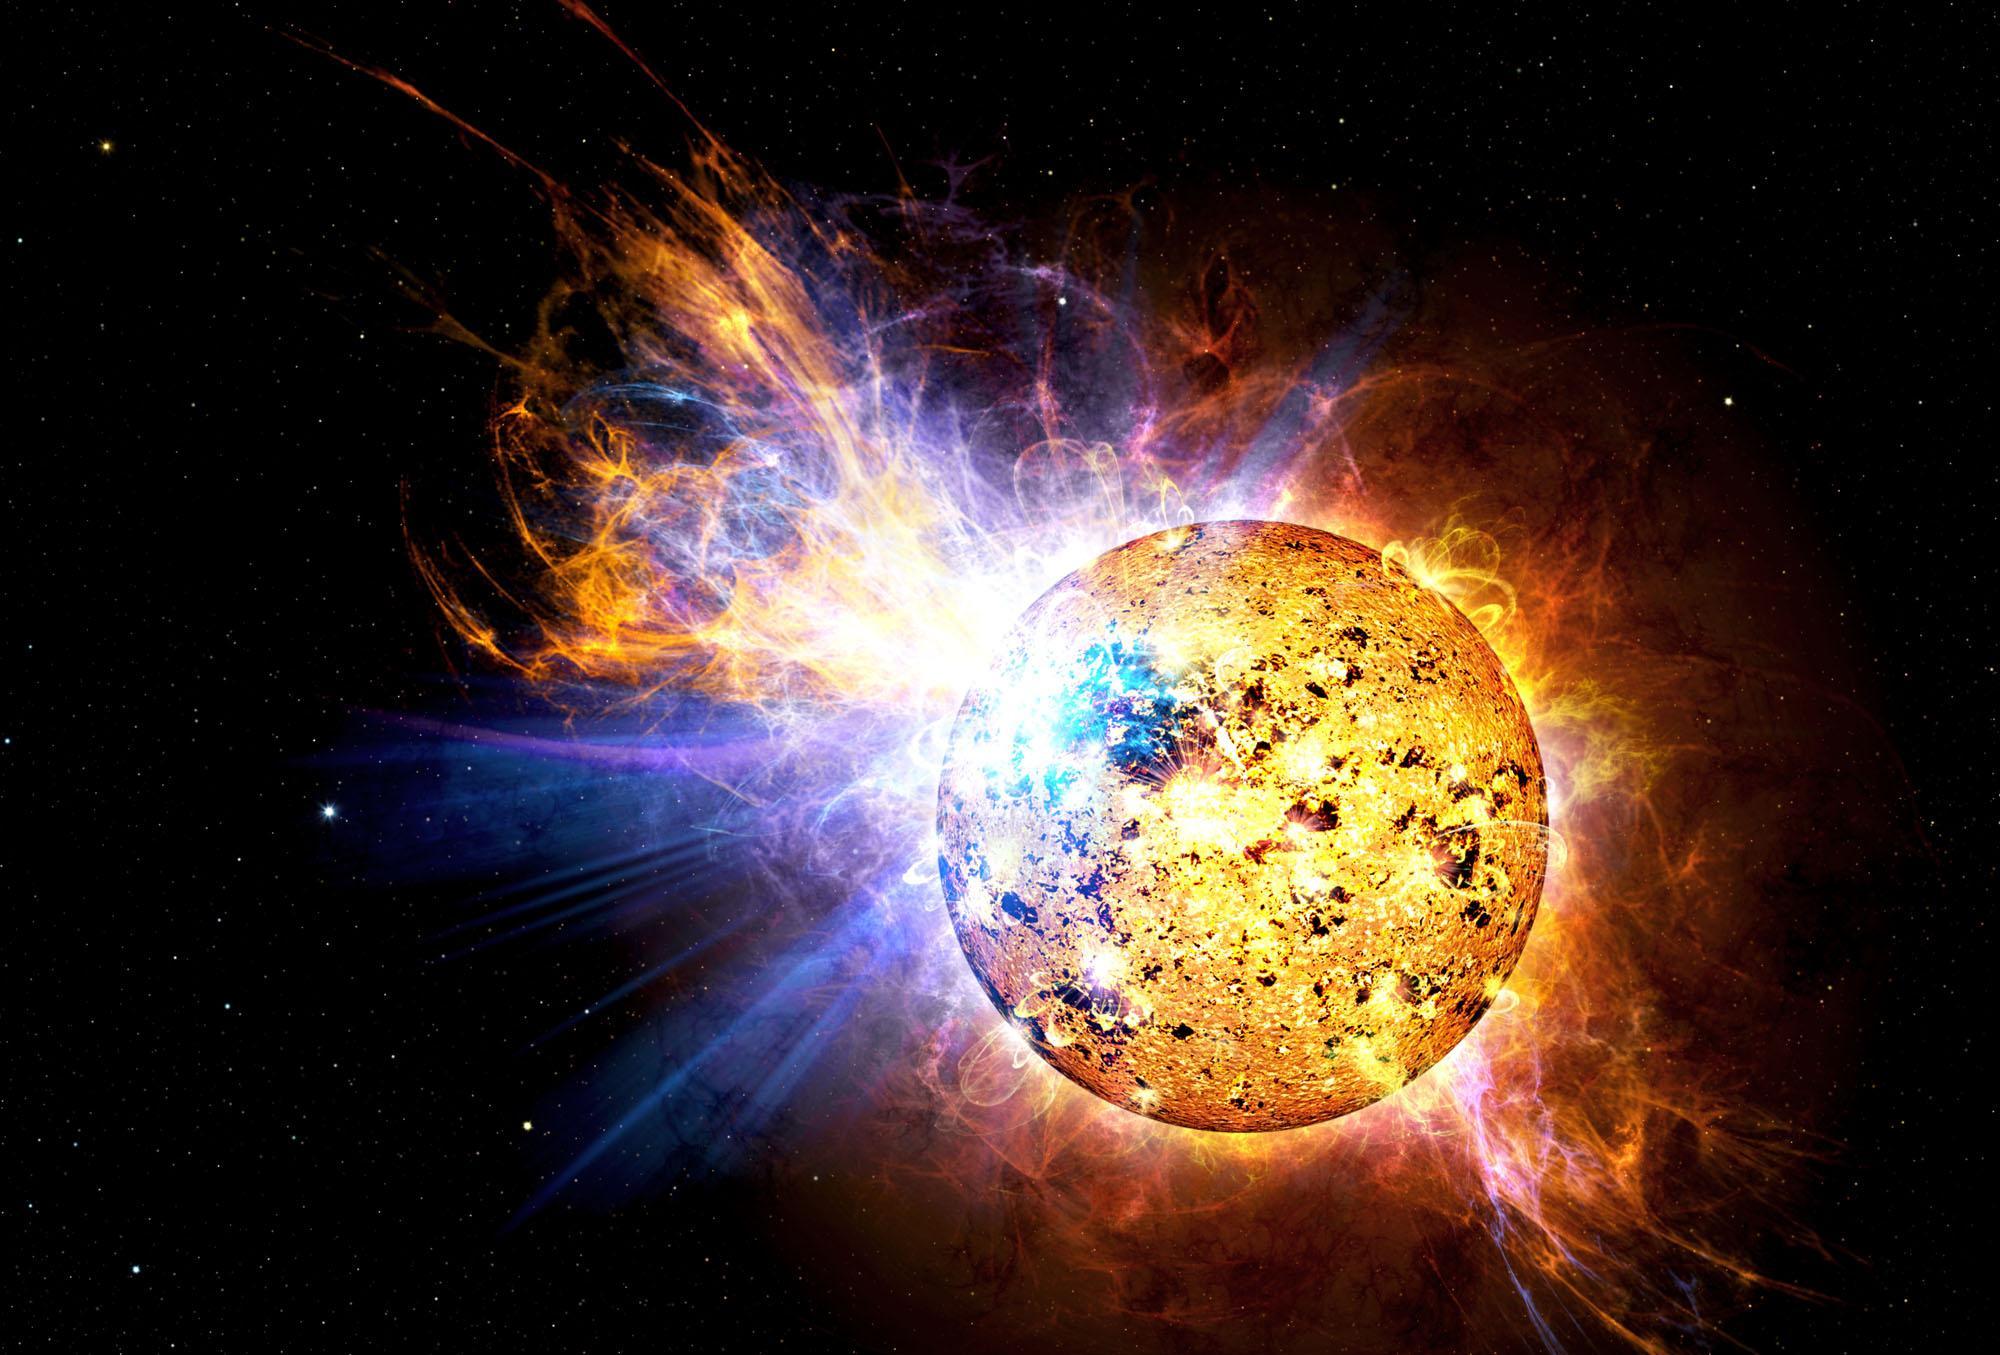 228177main_Red-Dwarf-Flare-Full_full